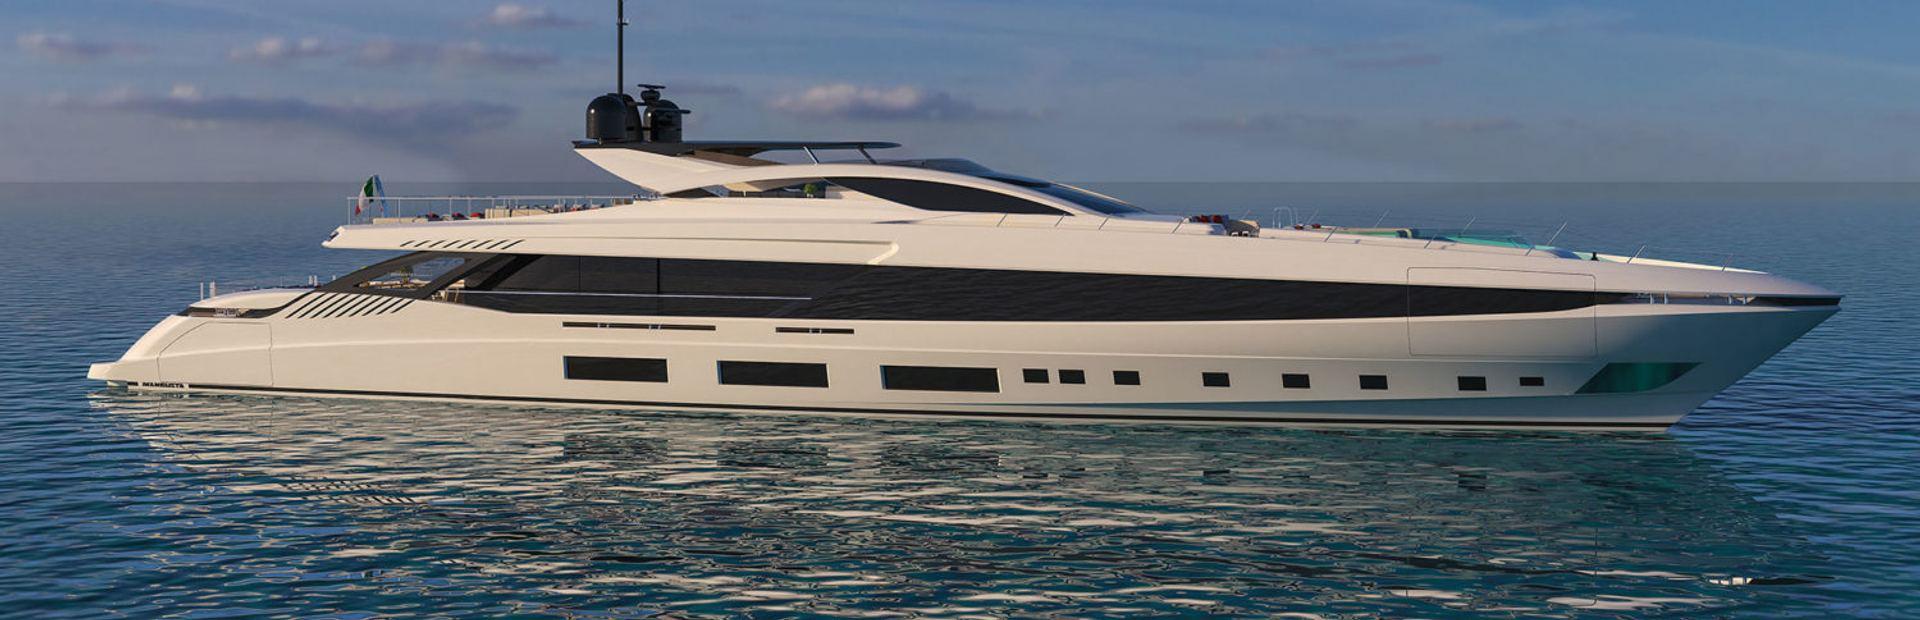 Mangusta GranSport 54 Yacht Charter